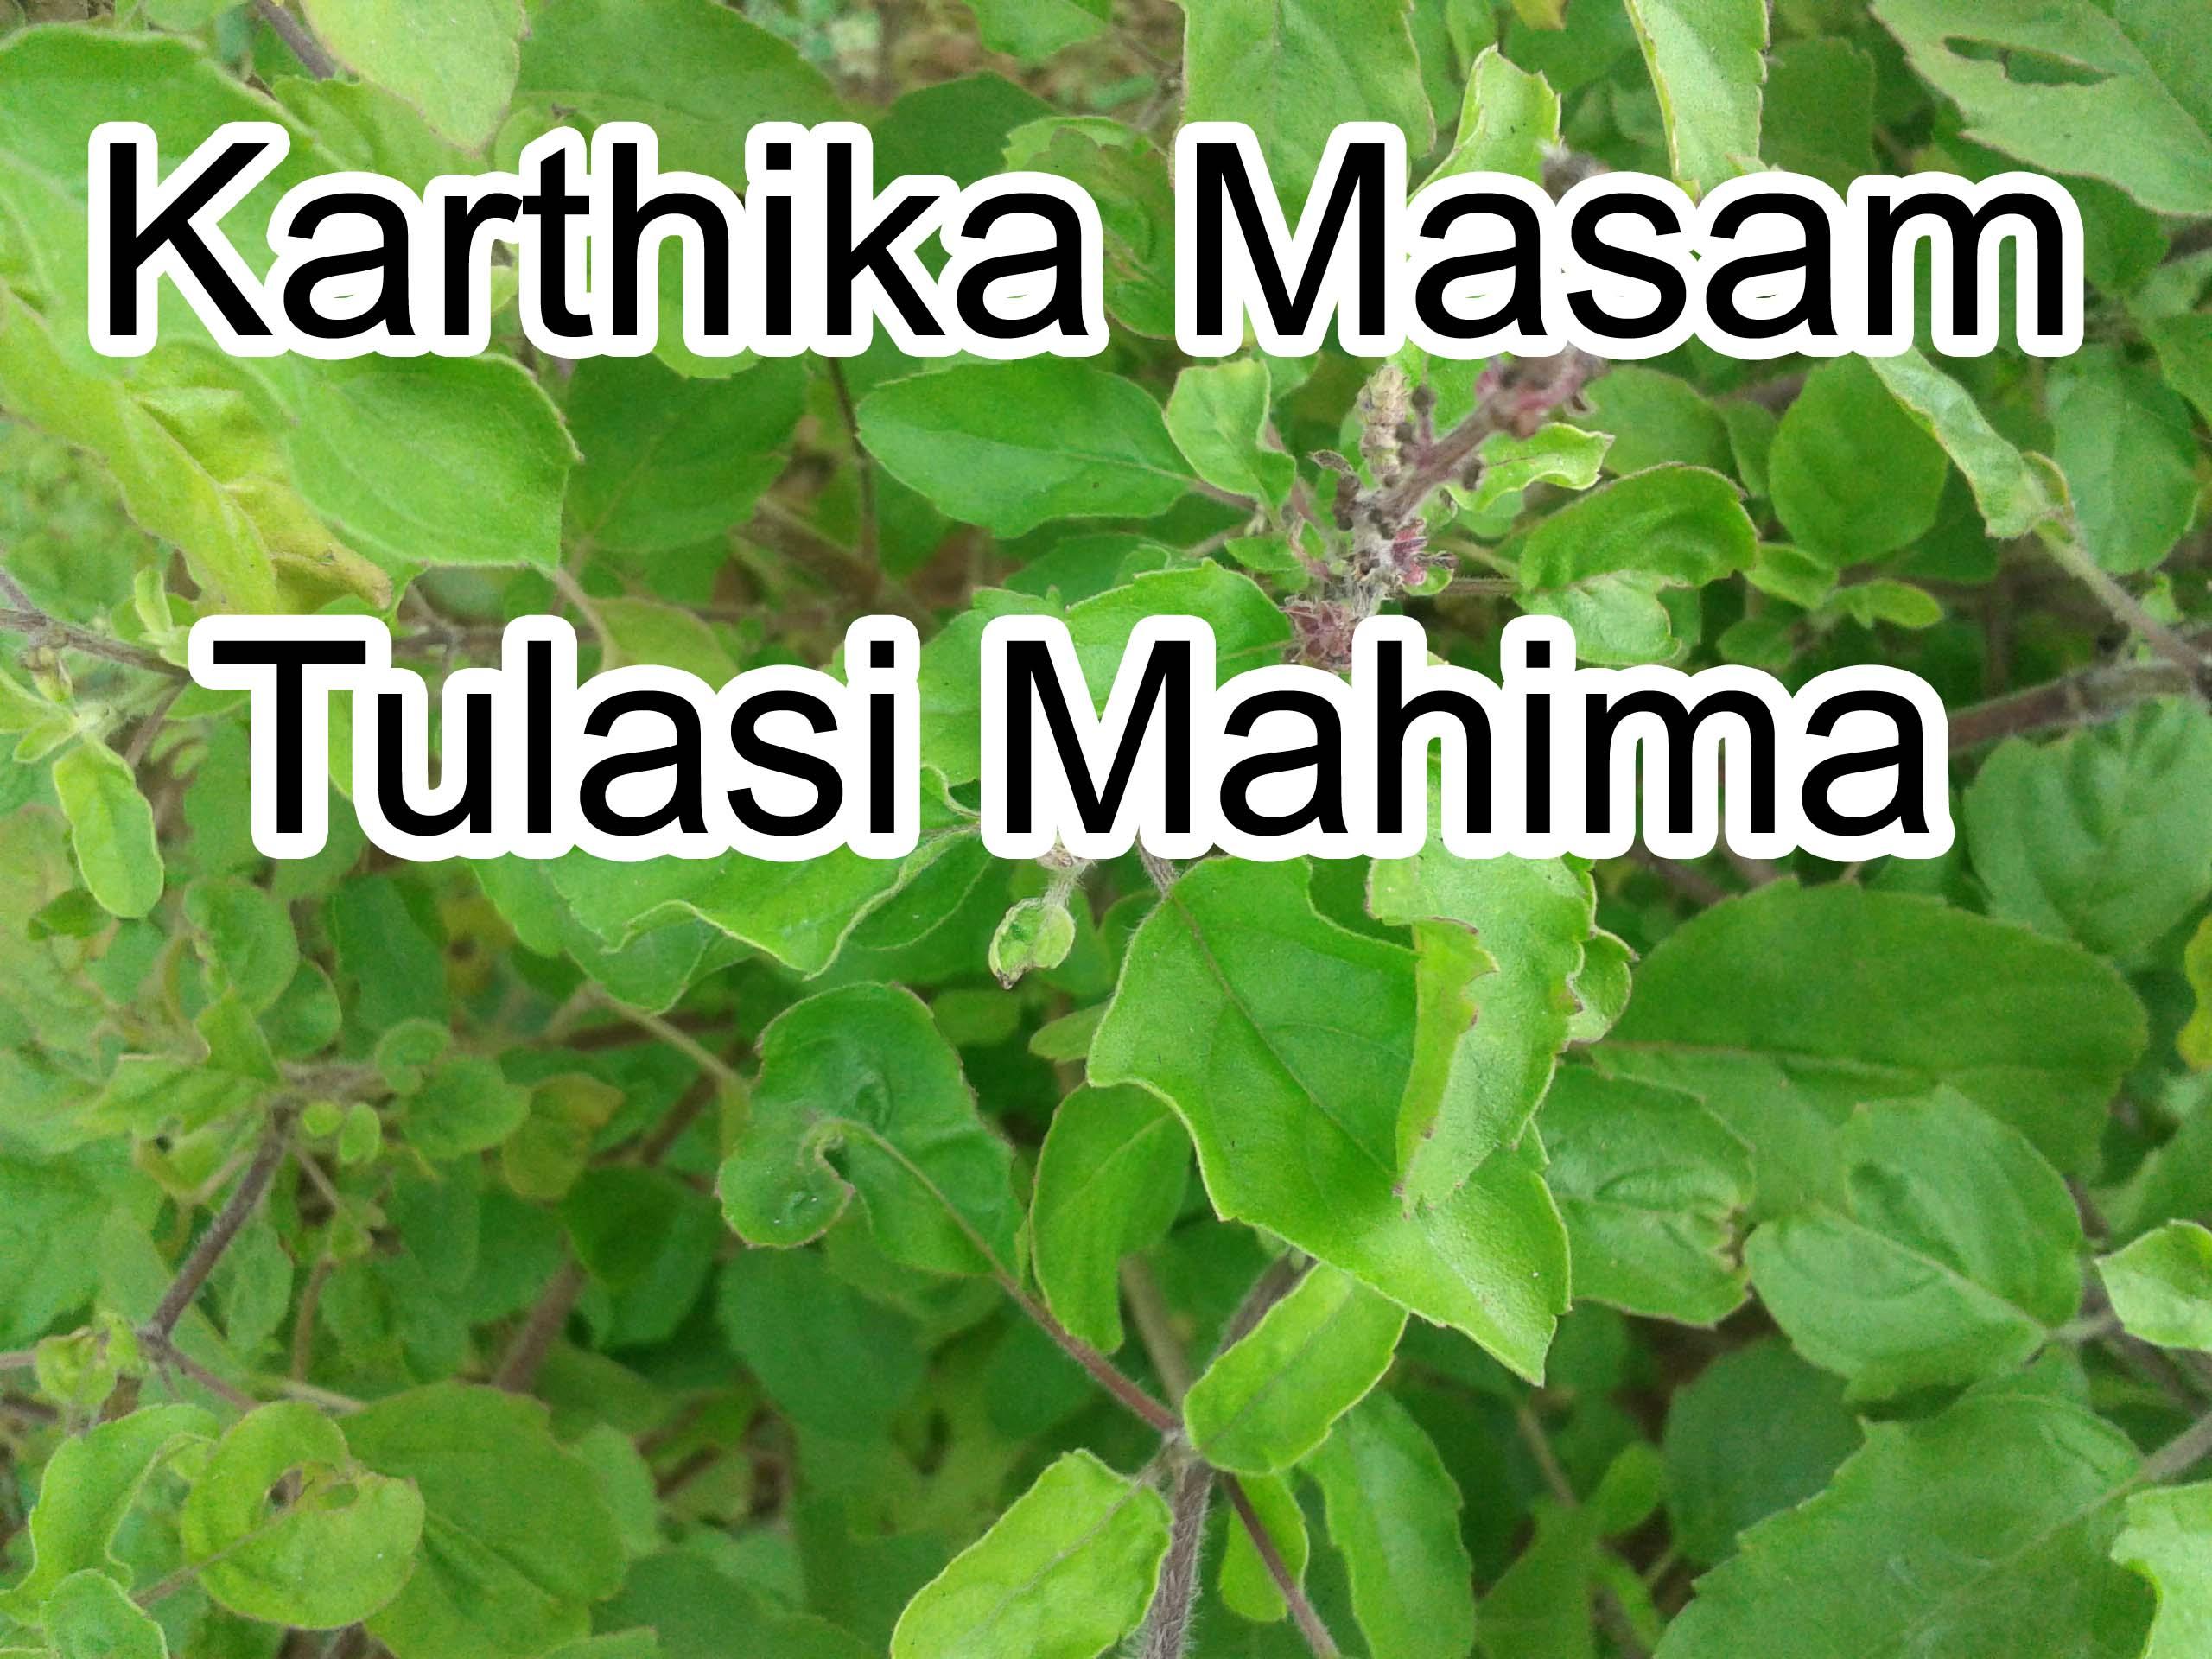 12Karthika Masam Tulasi Mahima